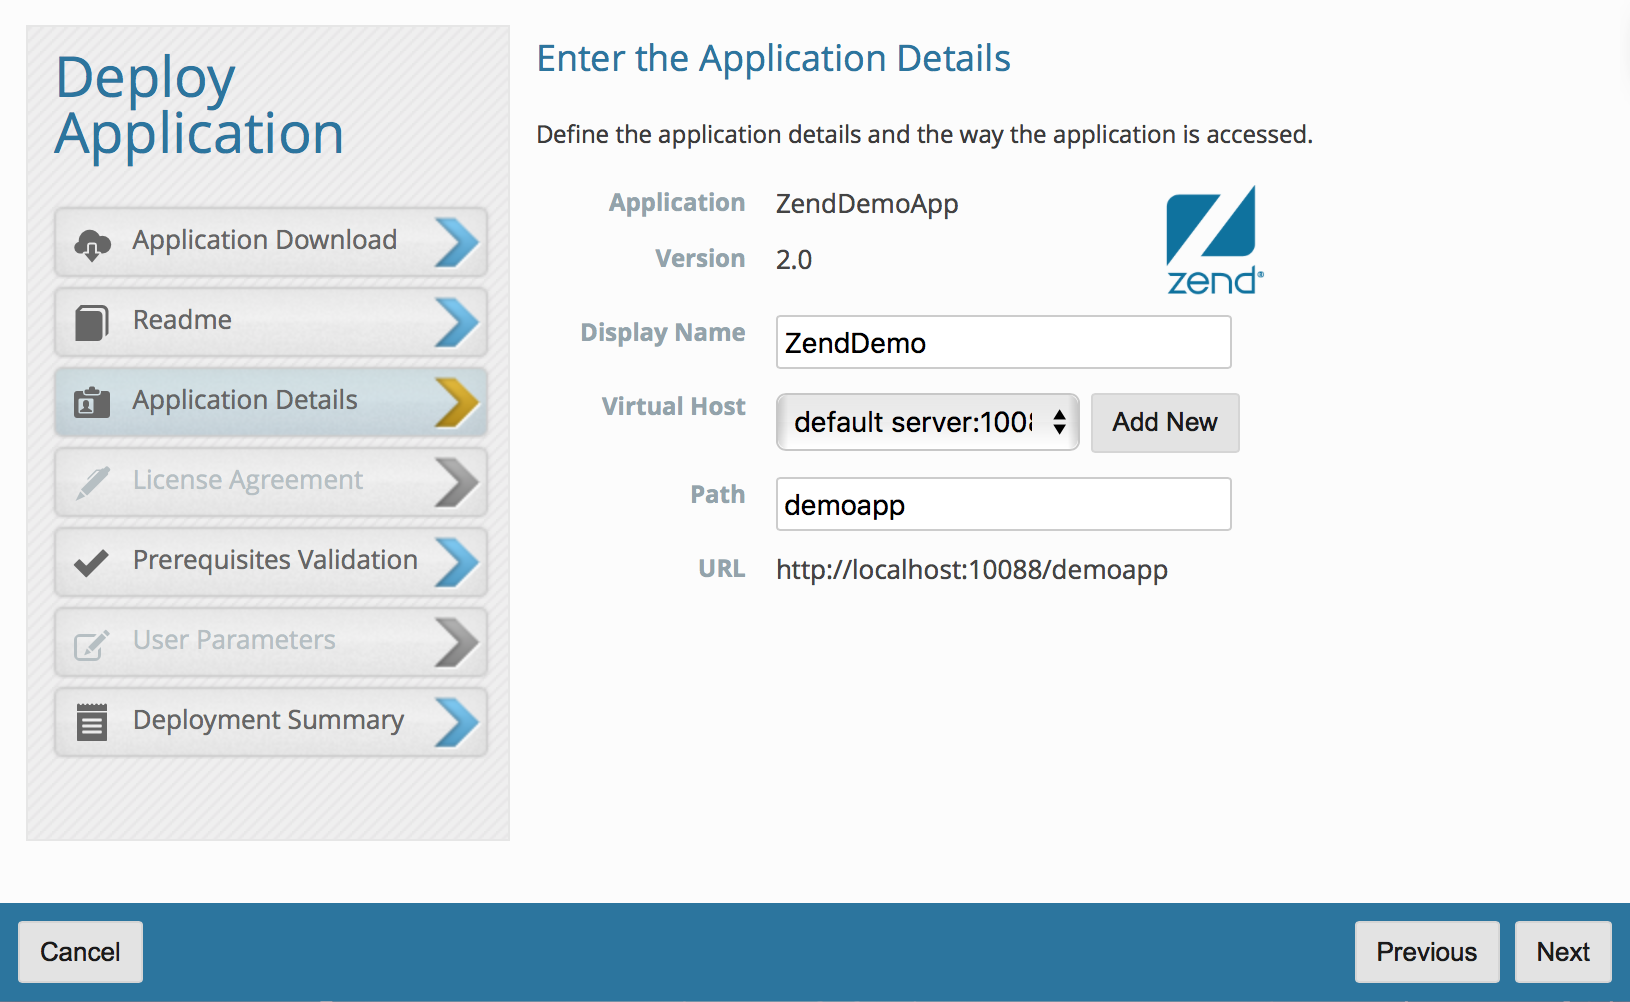 ps zend demo app step 1 details